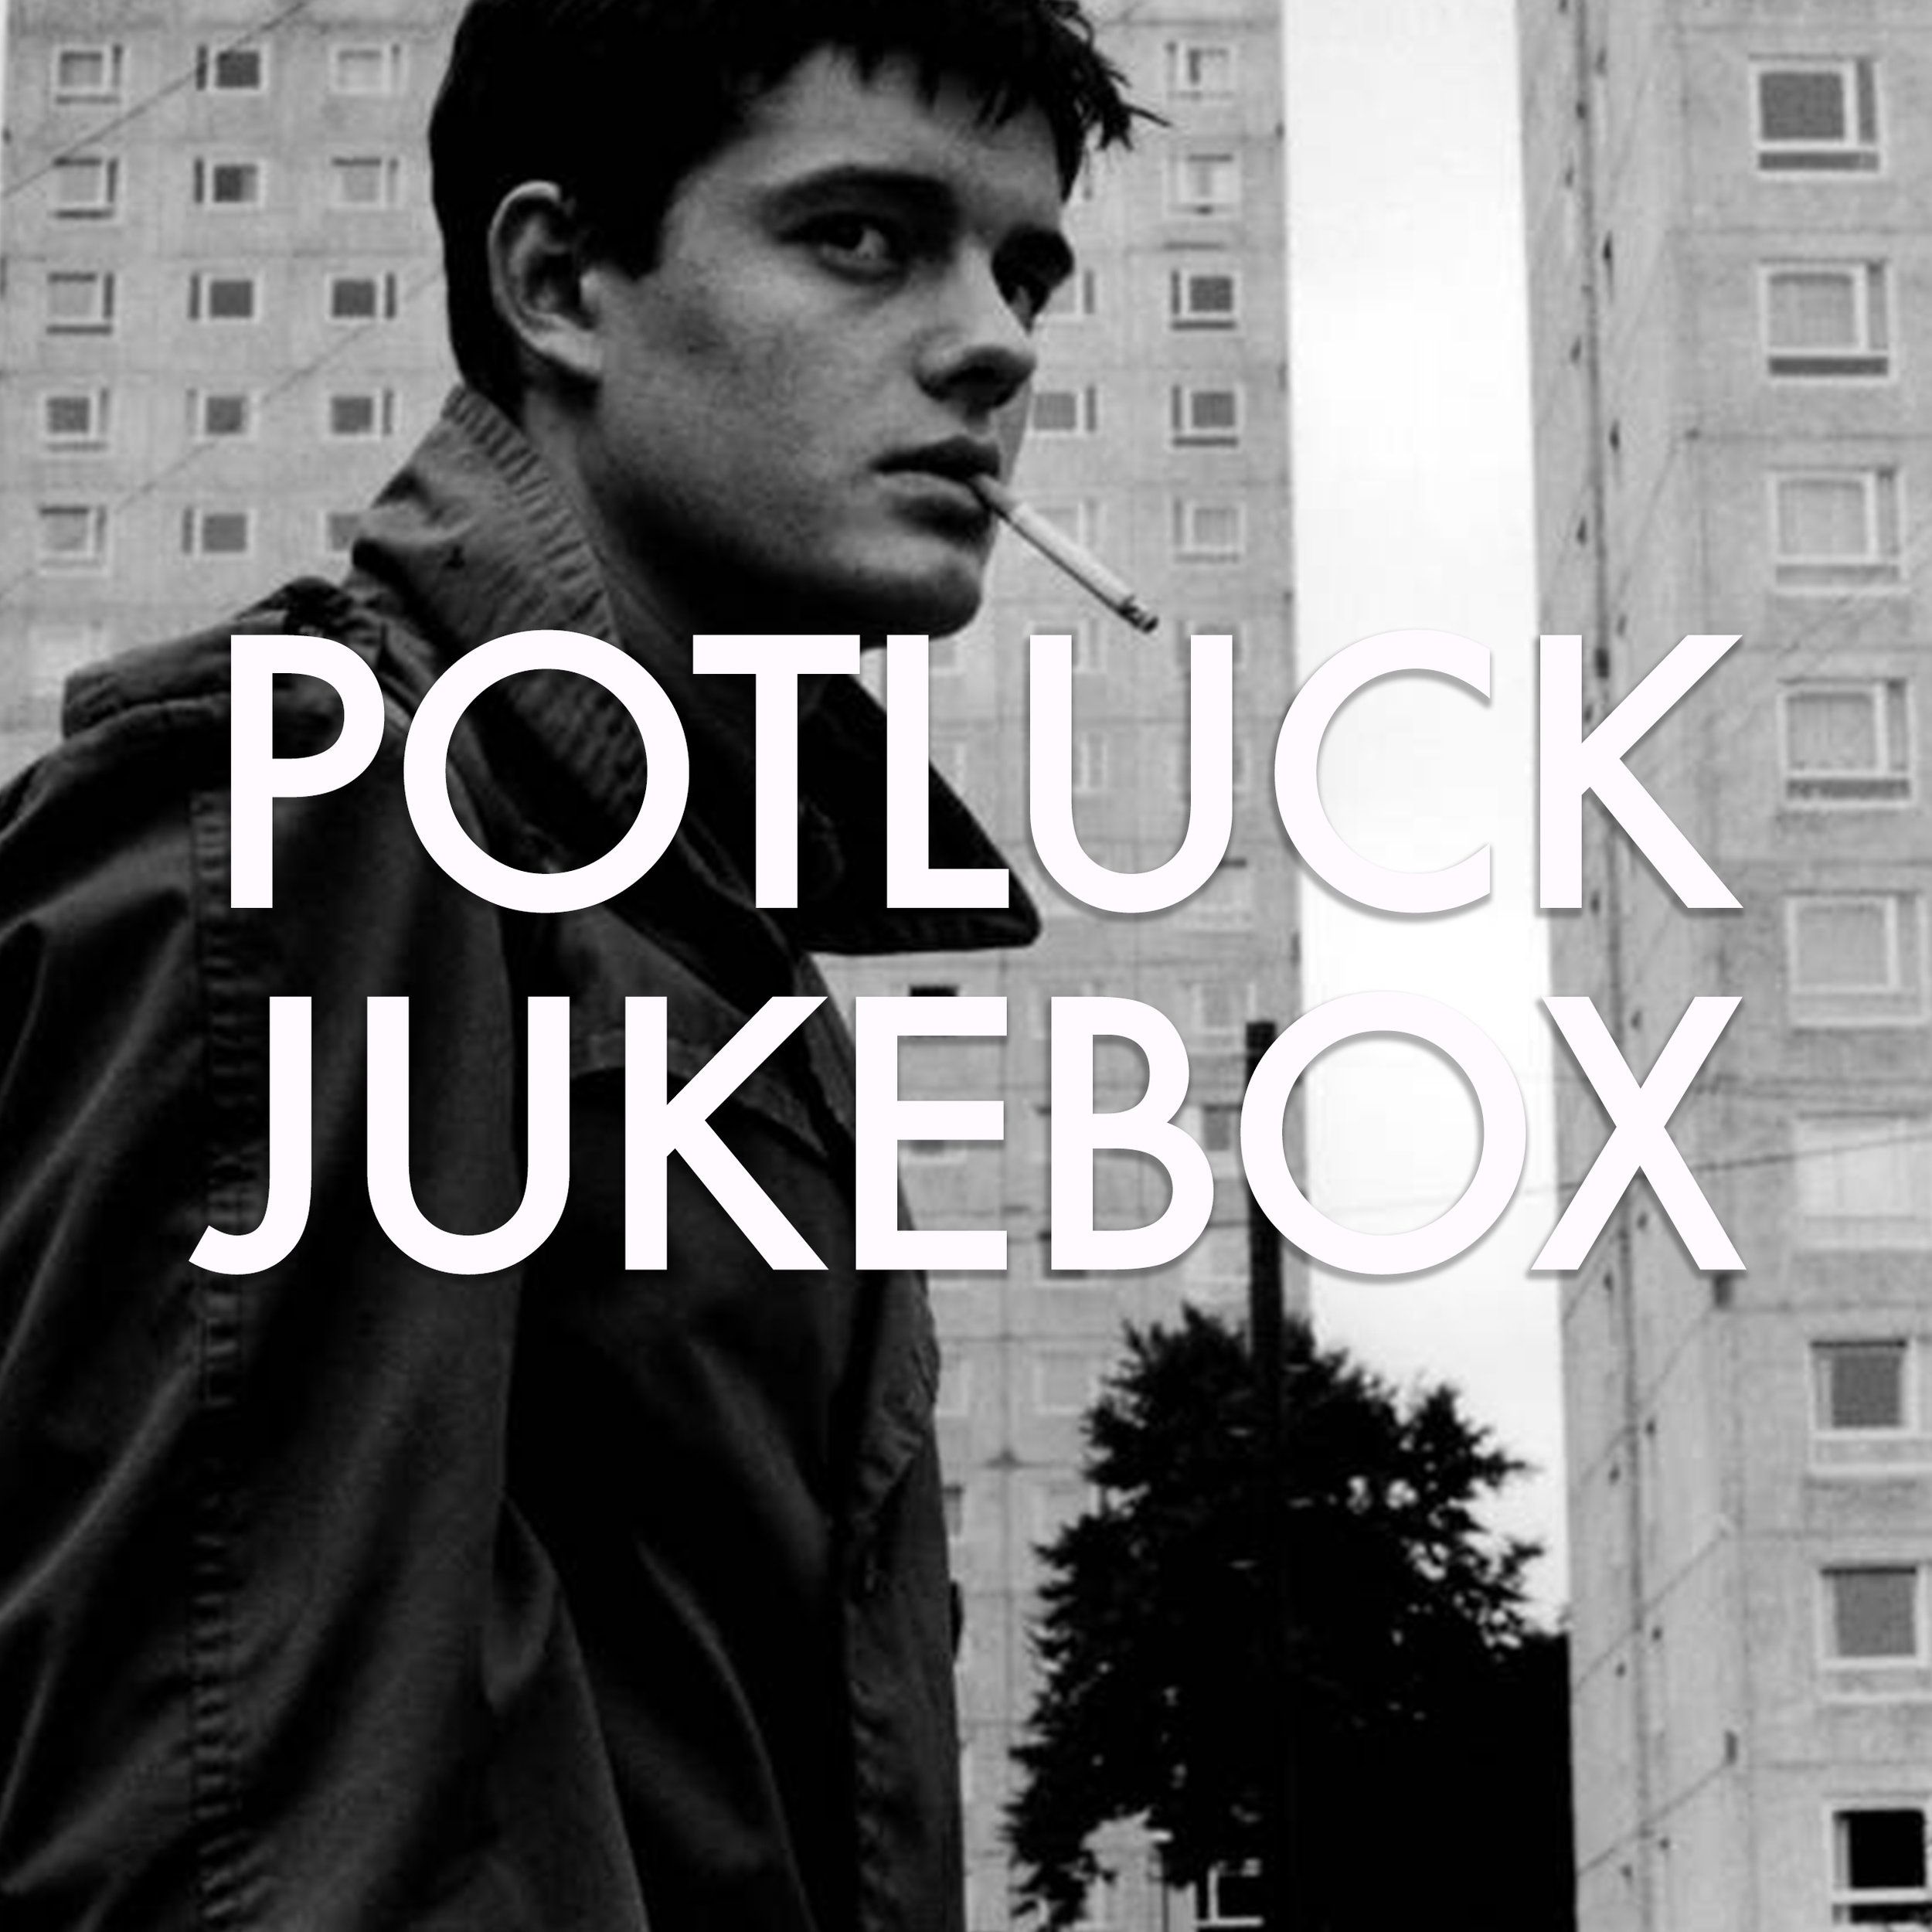 potluck jukebox_music_biopic.jpg